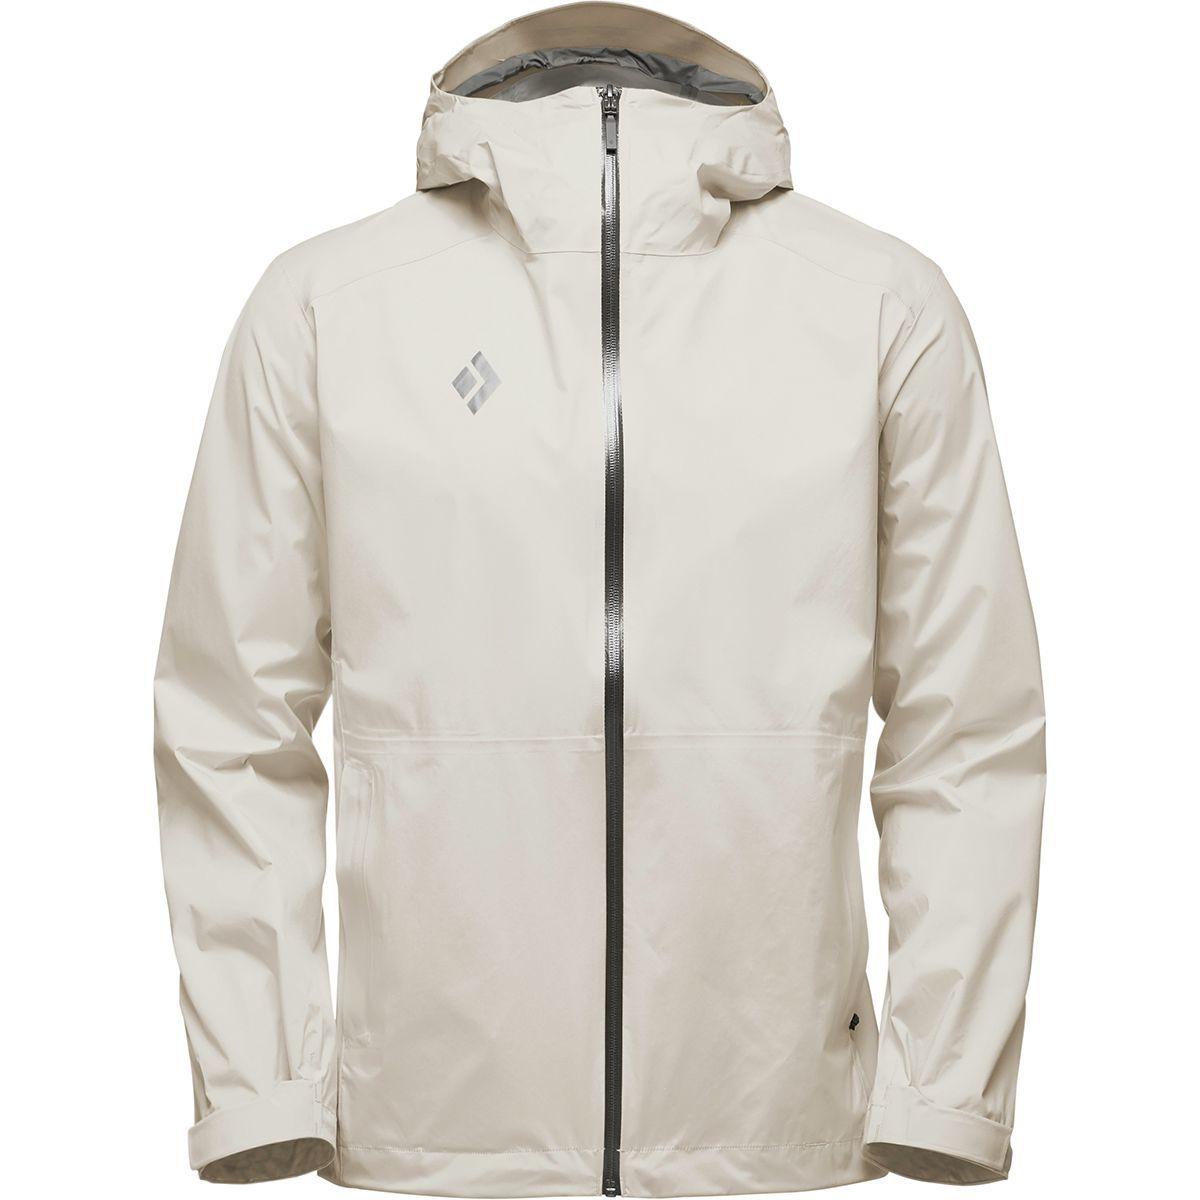 Black Diamond Stormline Stretch Rain Shell Jacket - Men's